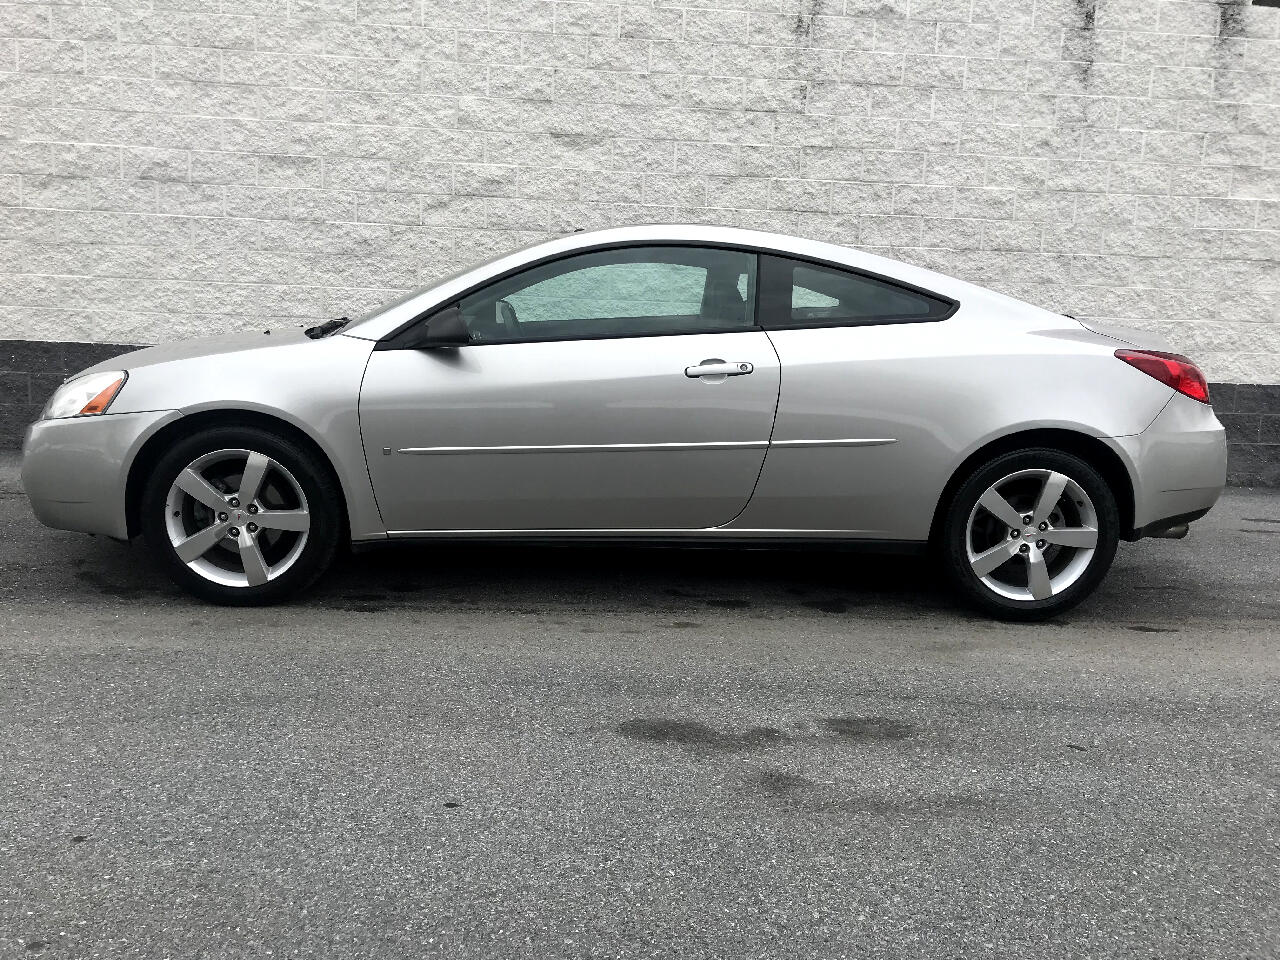 2006 Pontiac G6 2dr Cpe GTP